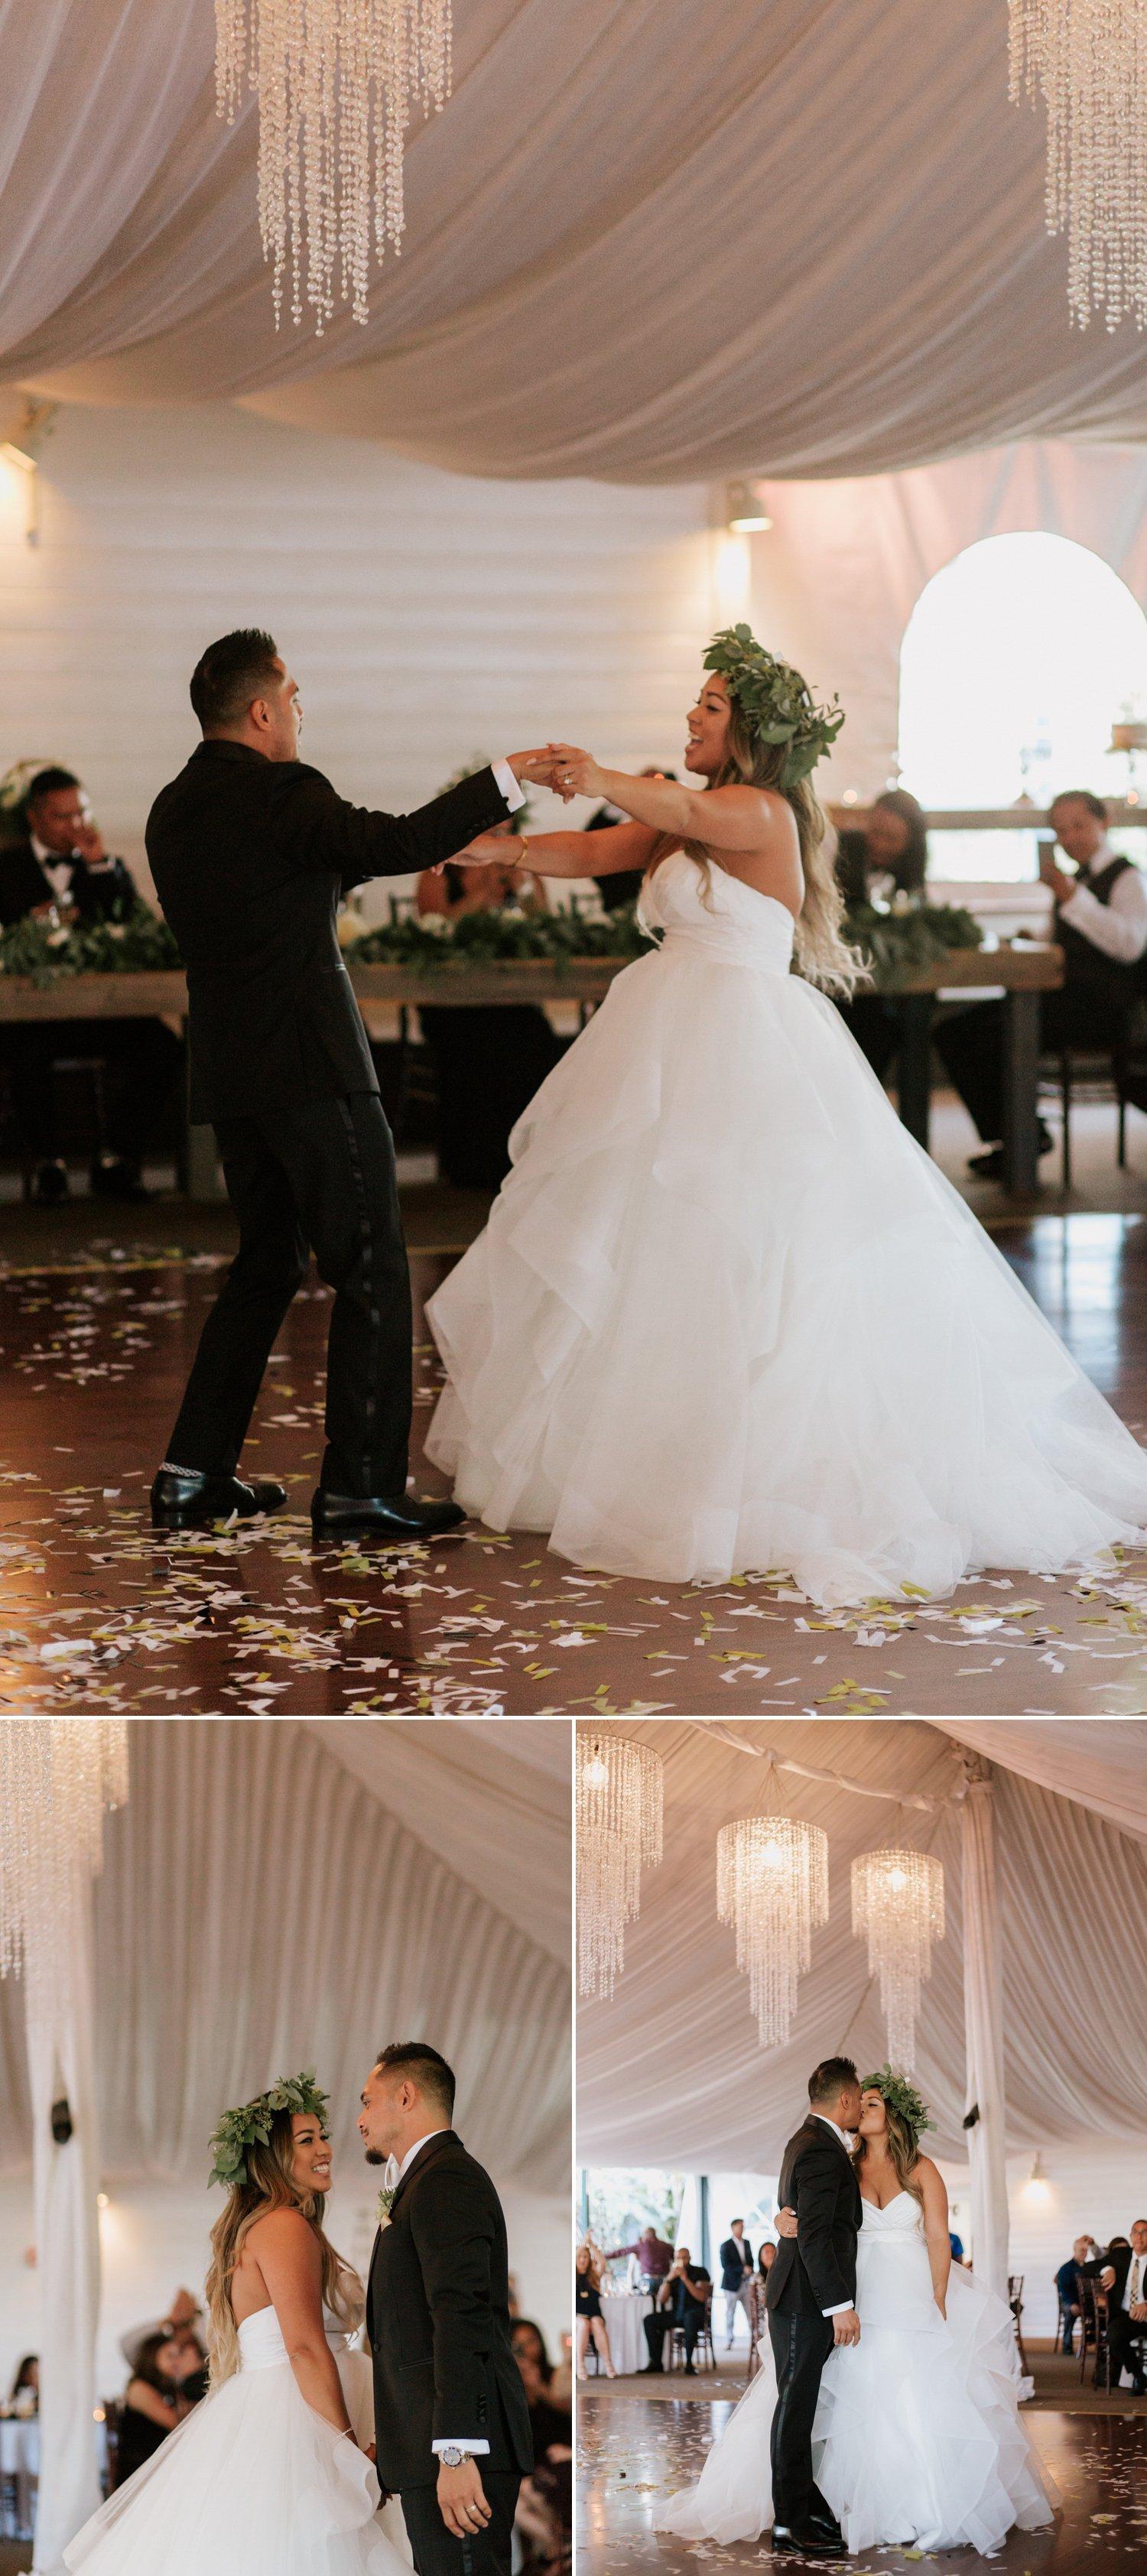 San Diego wedding photographer Paige Nelson